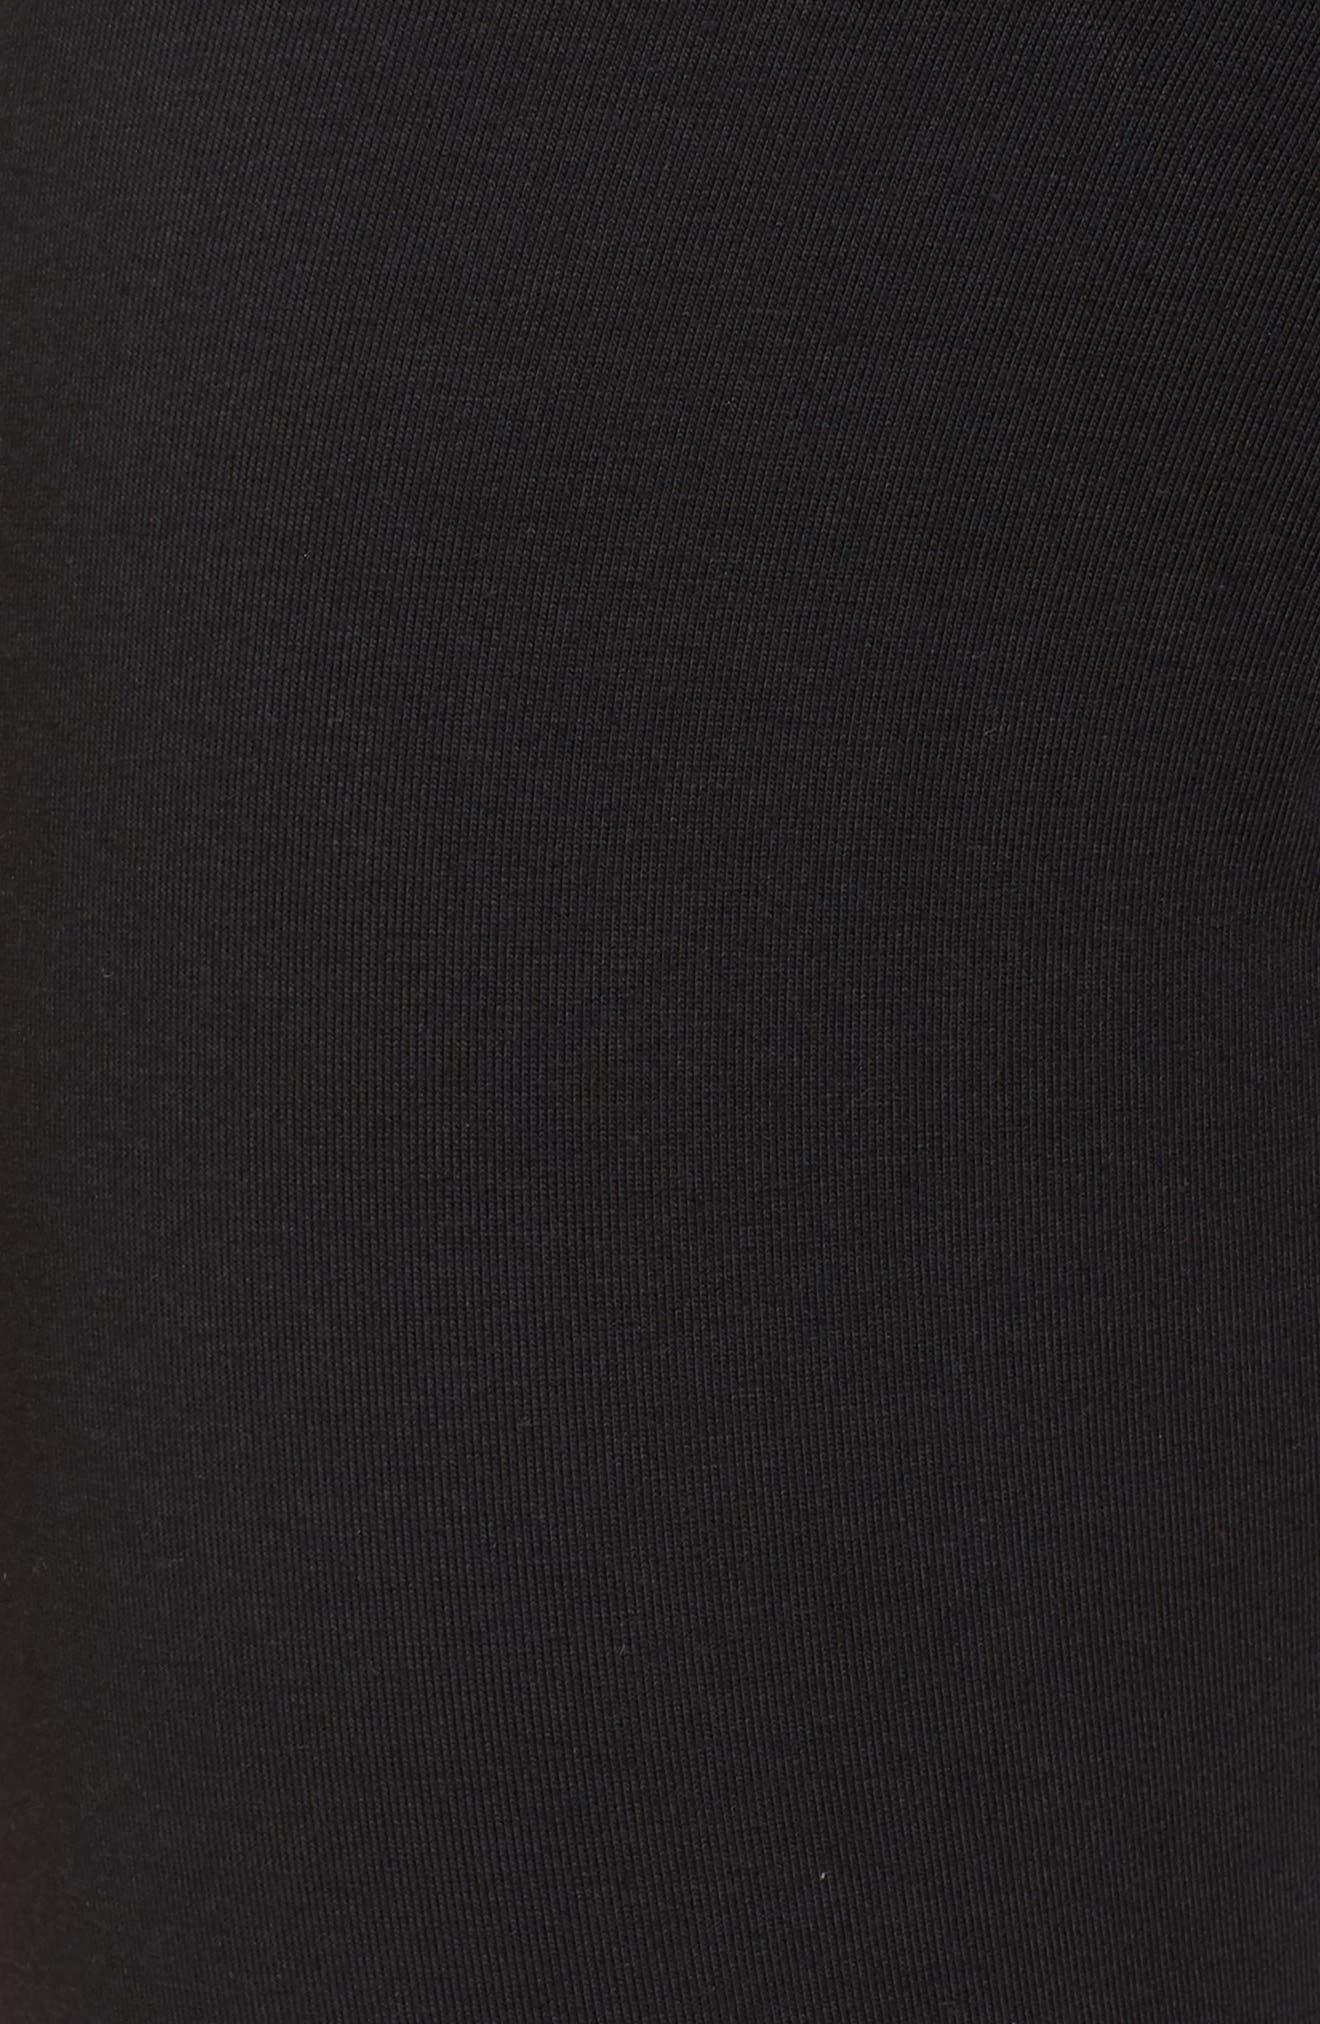 ADIDAS ORIGINALS, adidas 3-Stripes Tights, Alternate thumbnail 6, color, 001